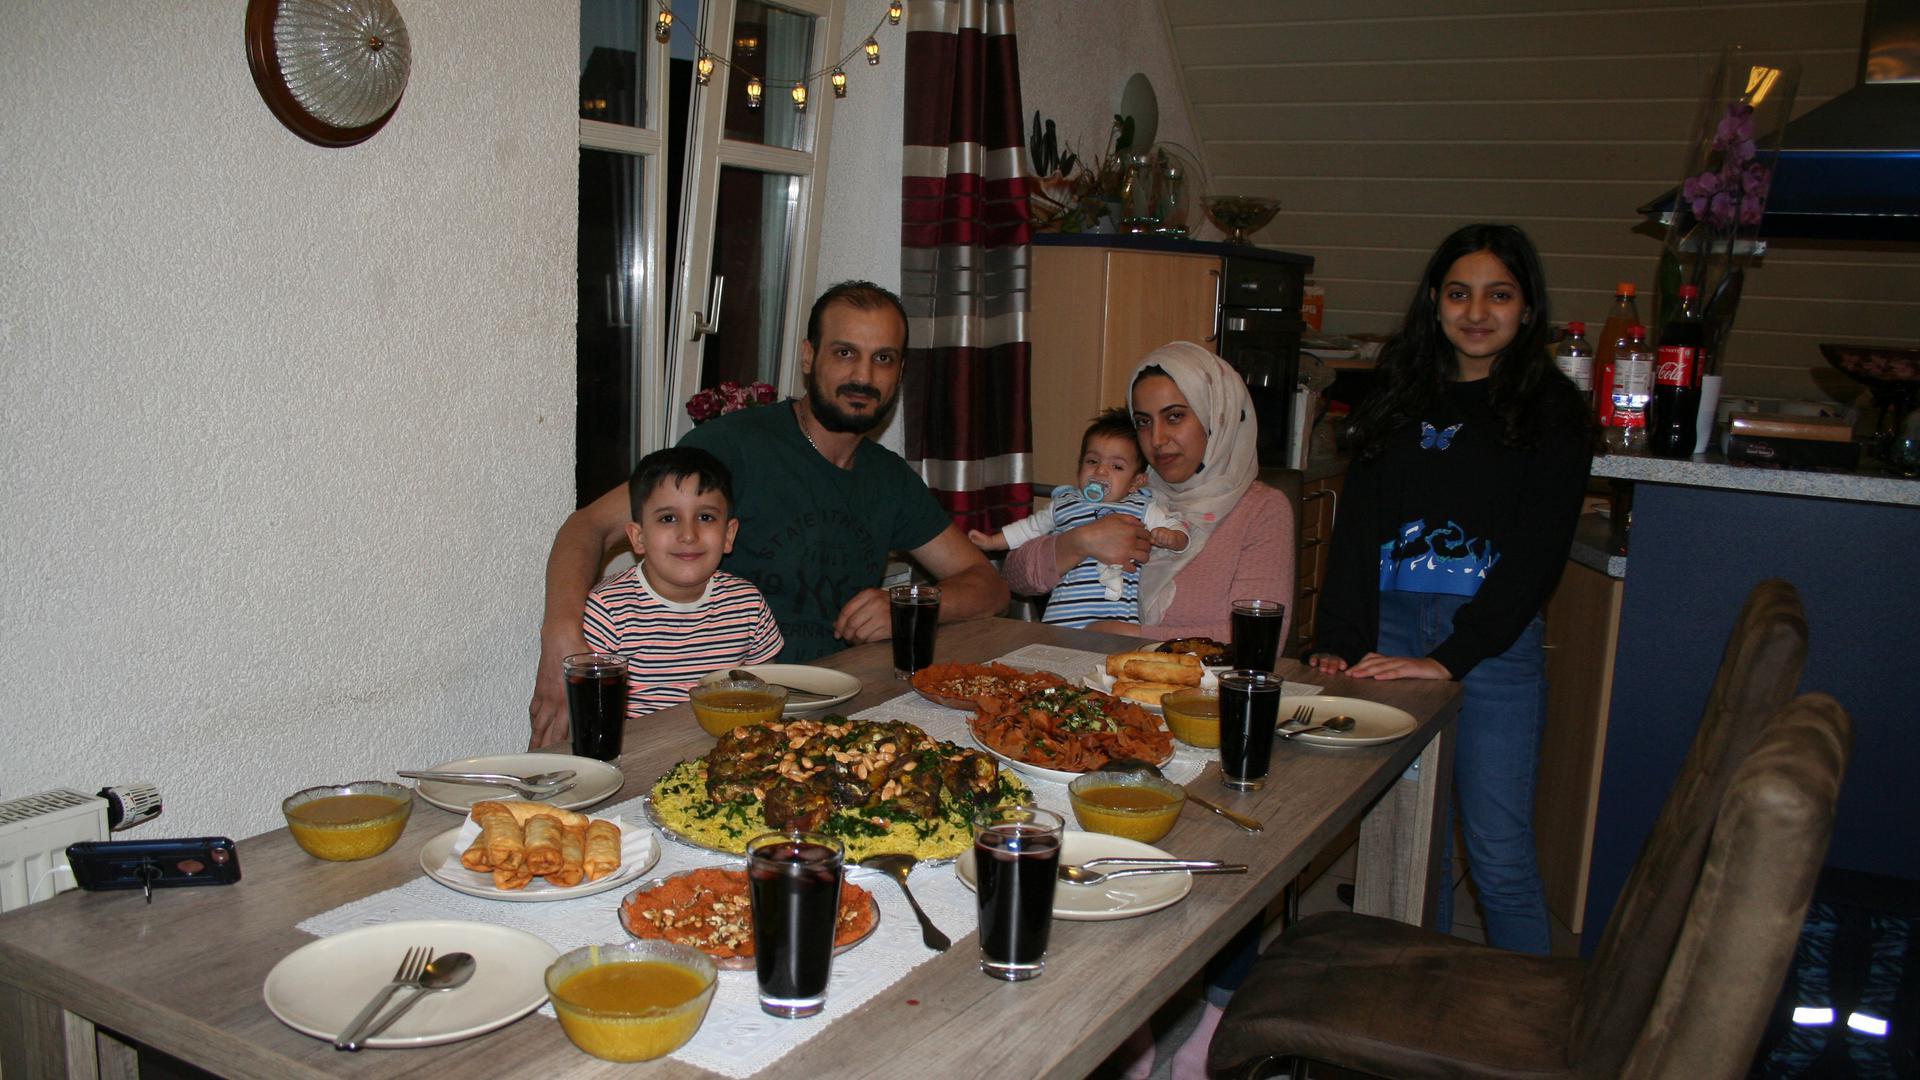 Familie Kola Ghasy (v.l.): Yazan, Alaa, Lilyan mit Baby Rawad und Rima